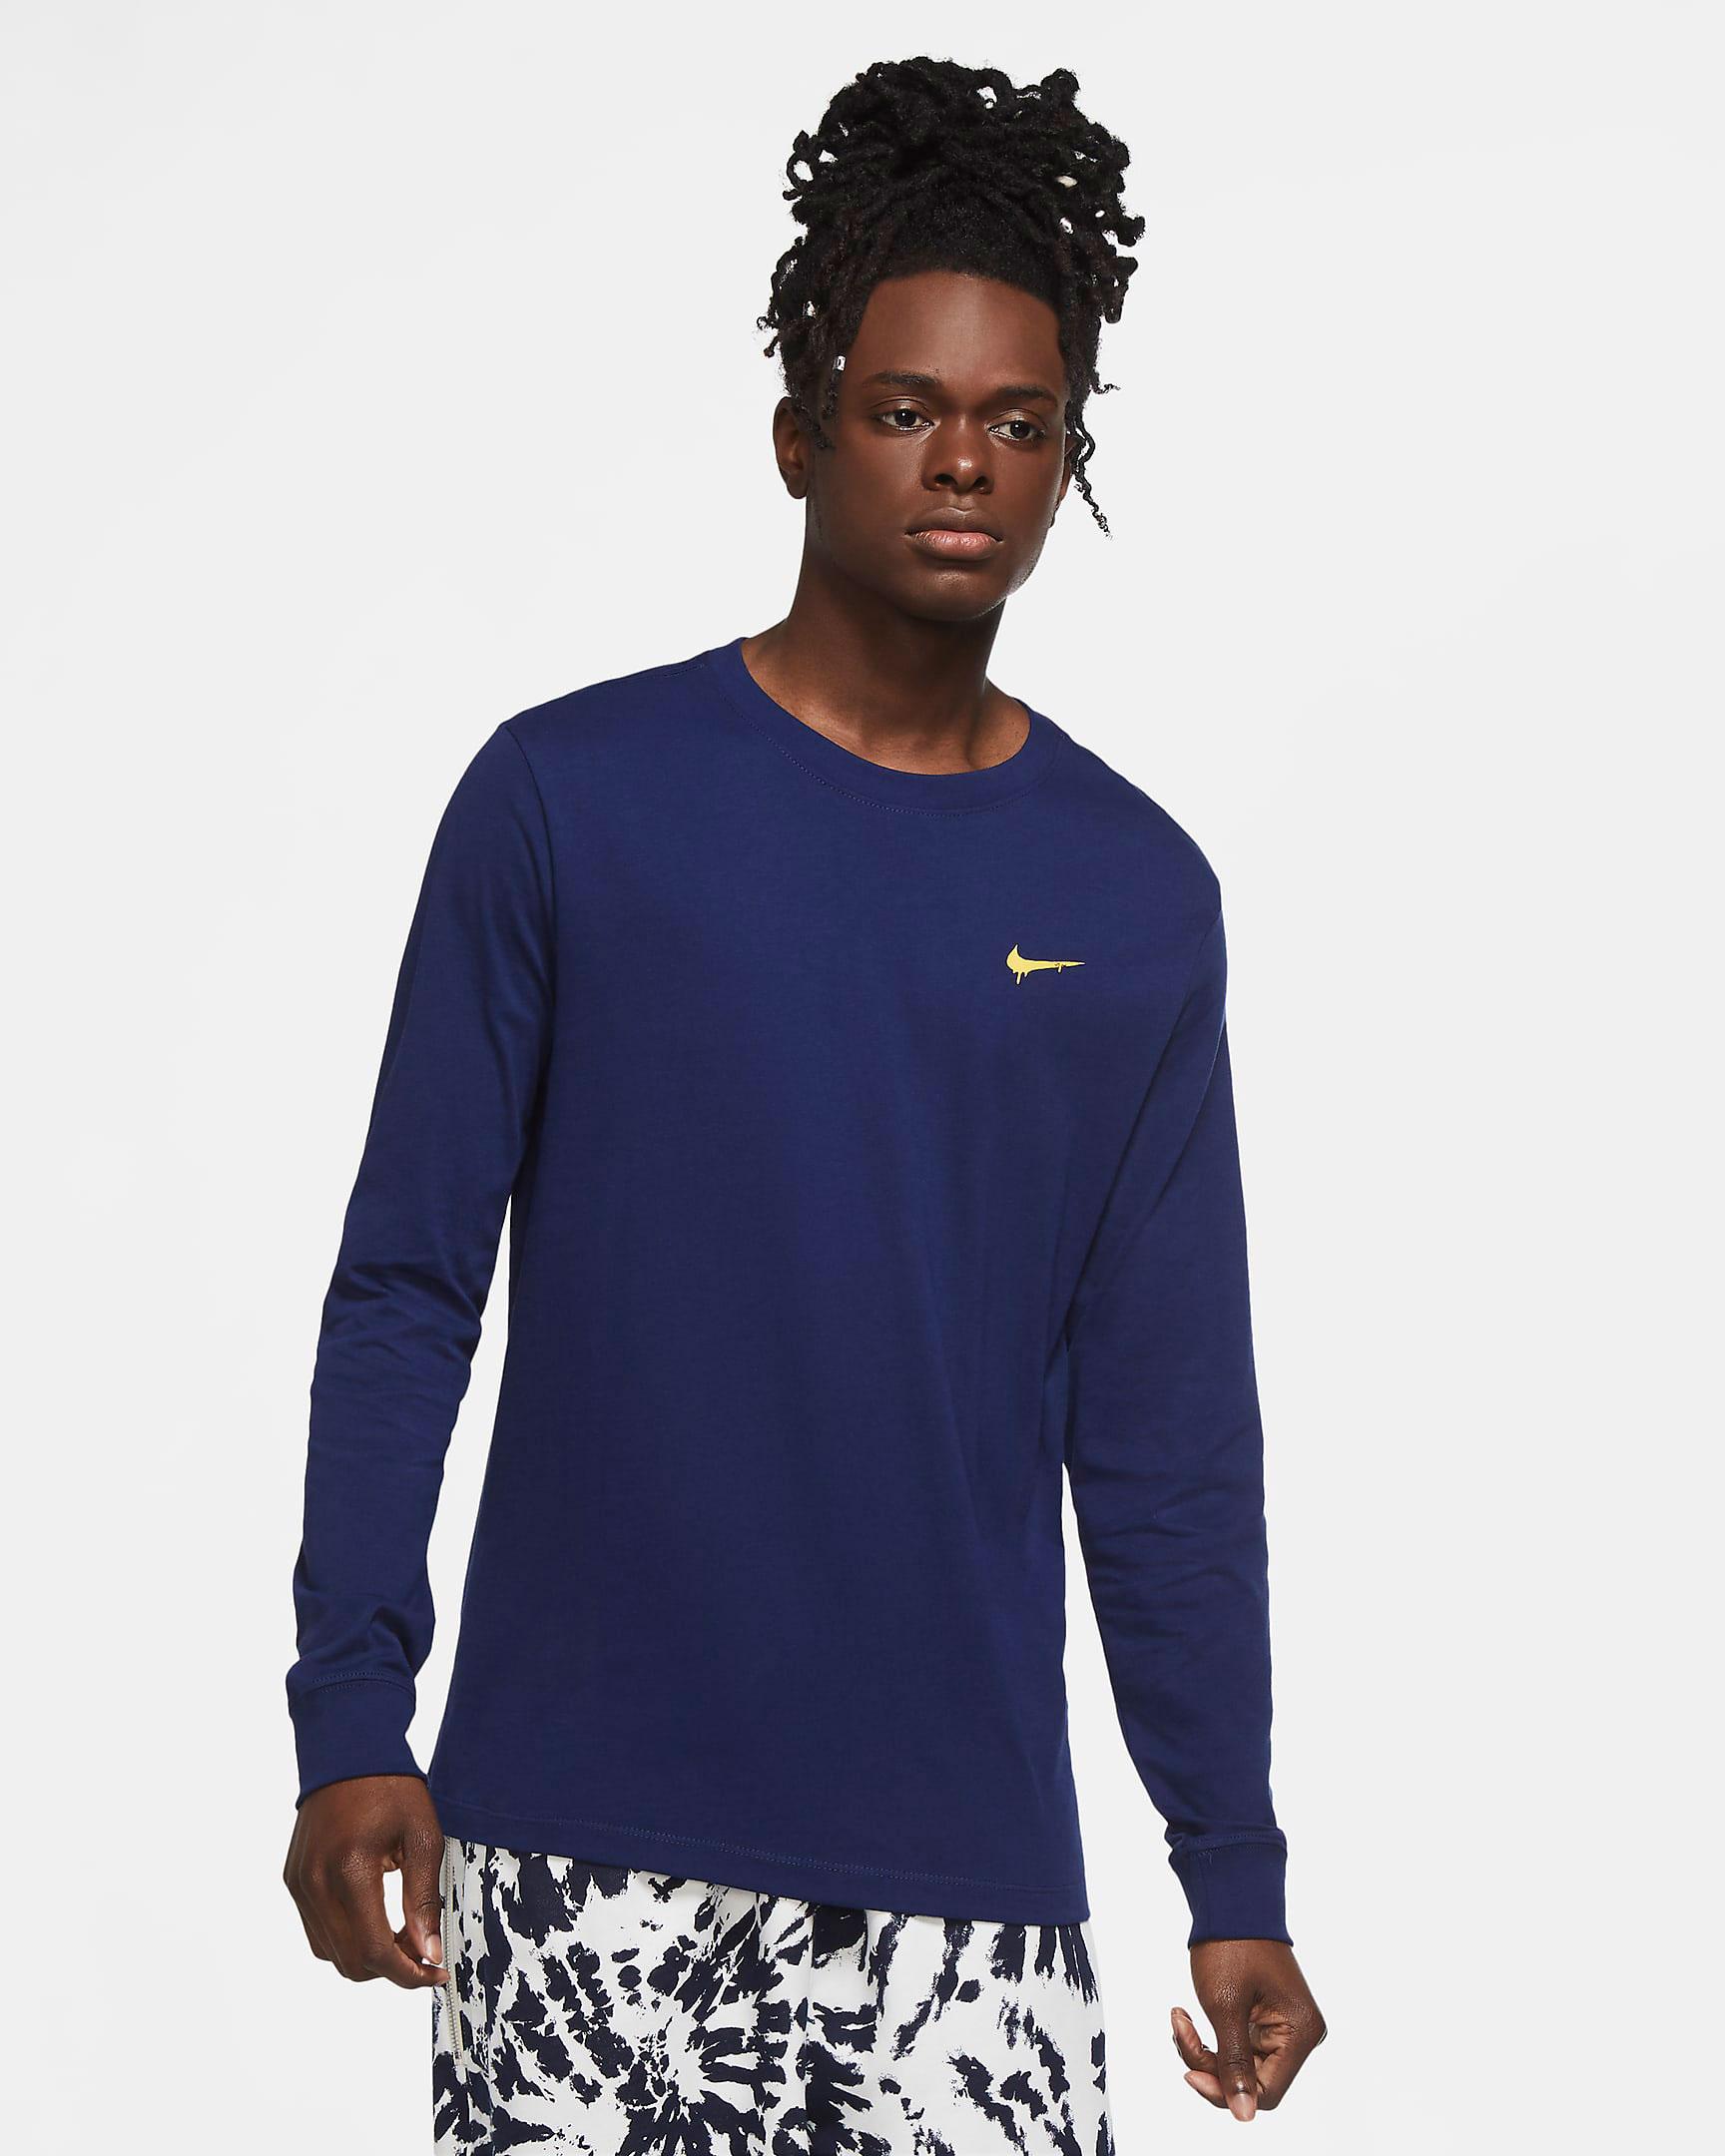 nike-peace-love-basketball-long-sleeve-shirt-navy-1